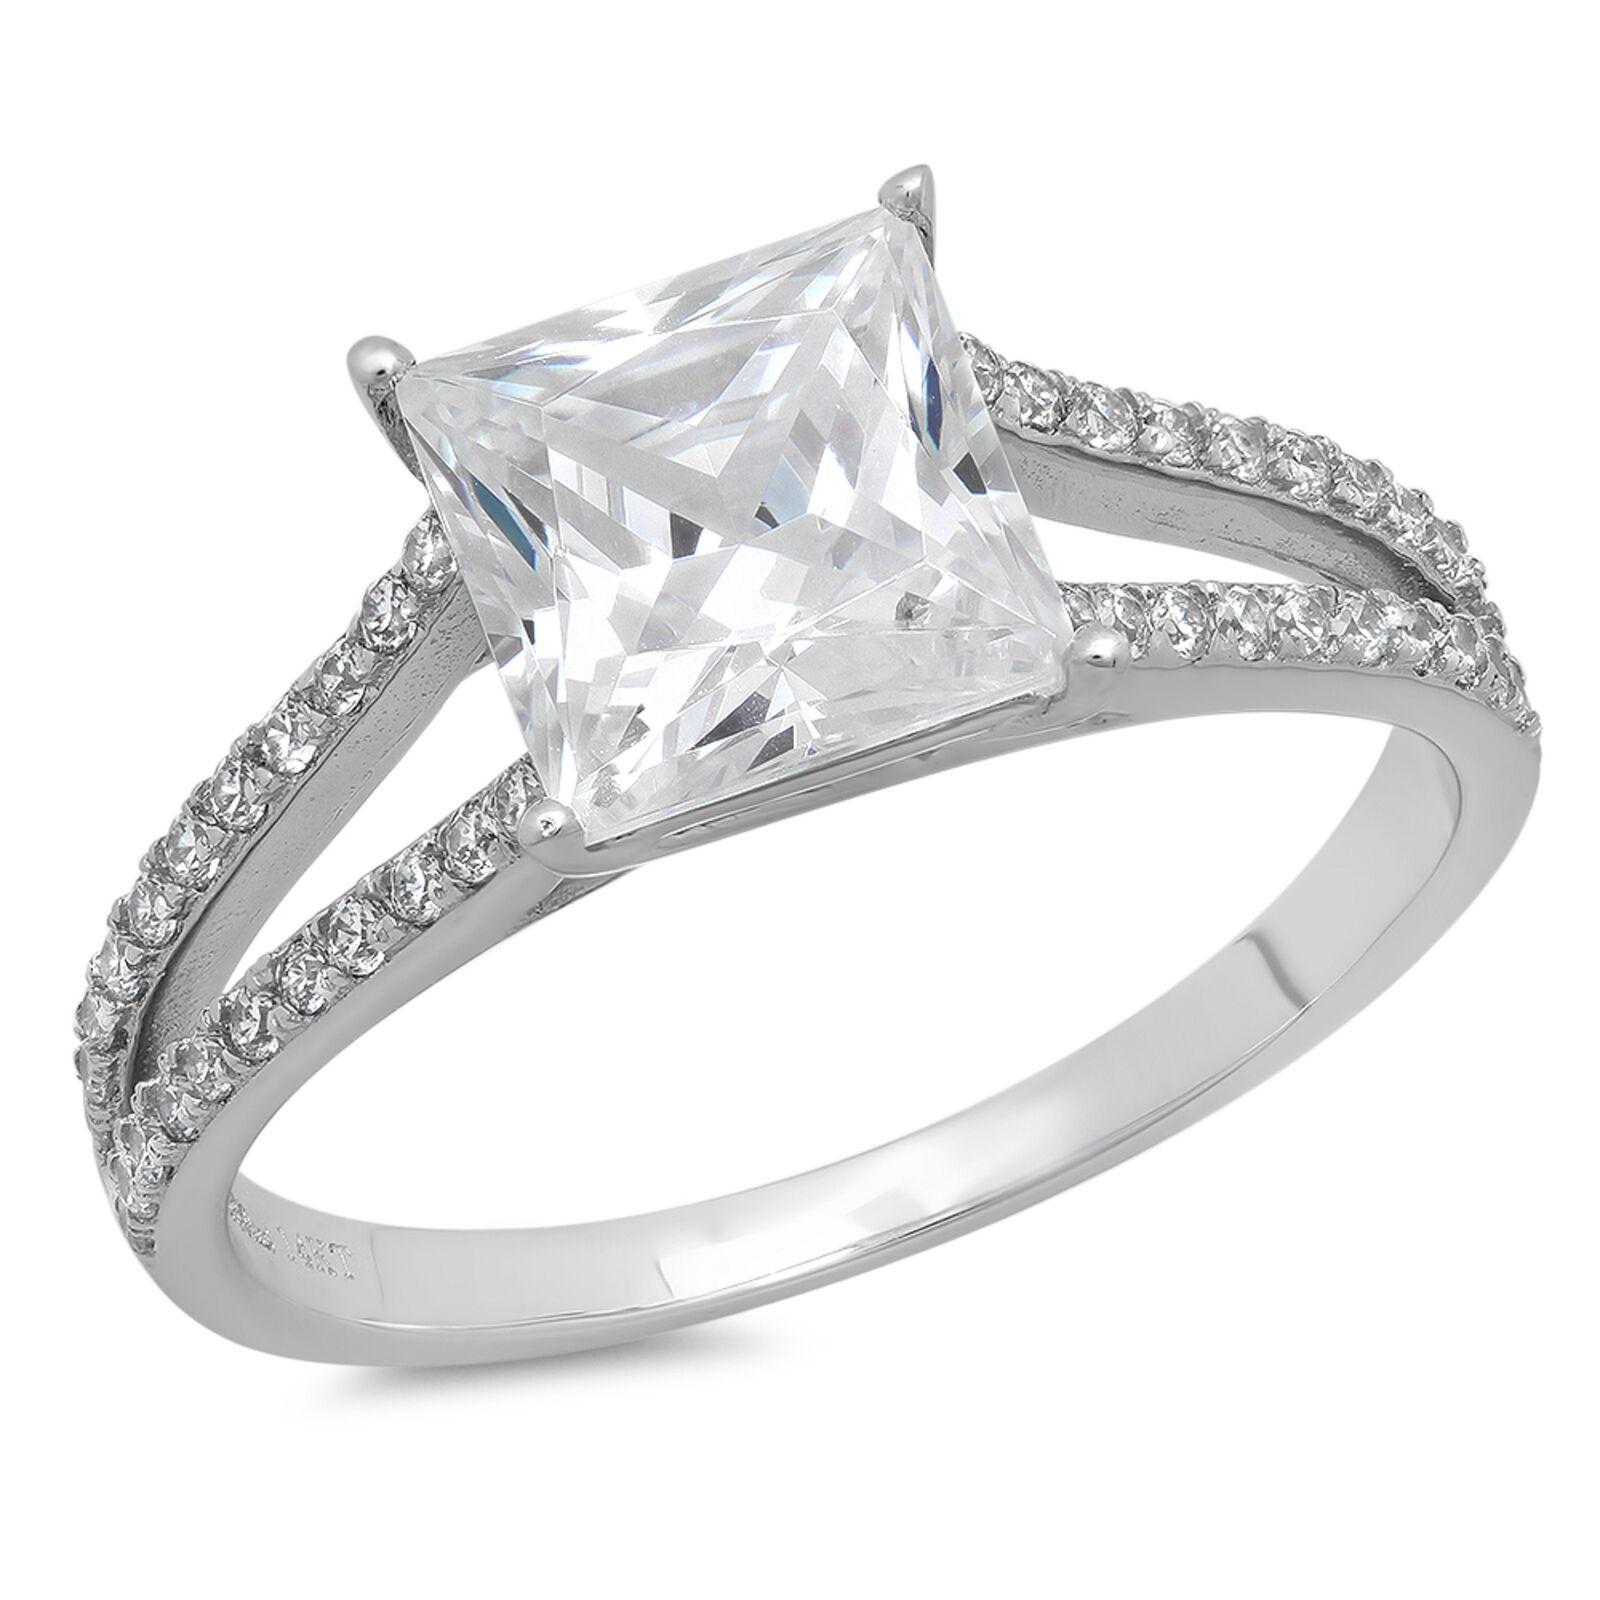 2.32ct Princess Cut Wedding Bridal Engagement Anniversary Ring 14k White gold